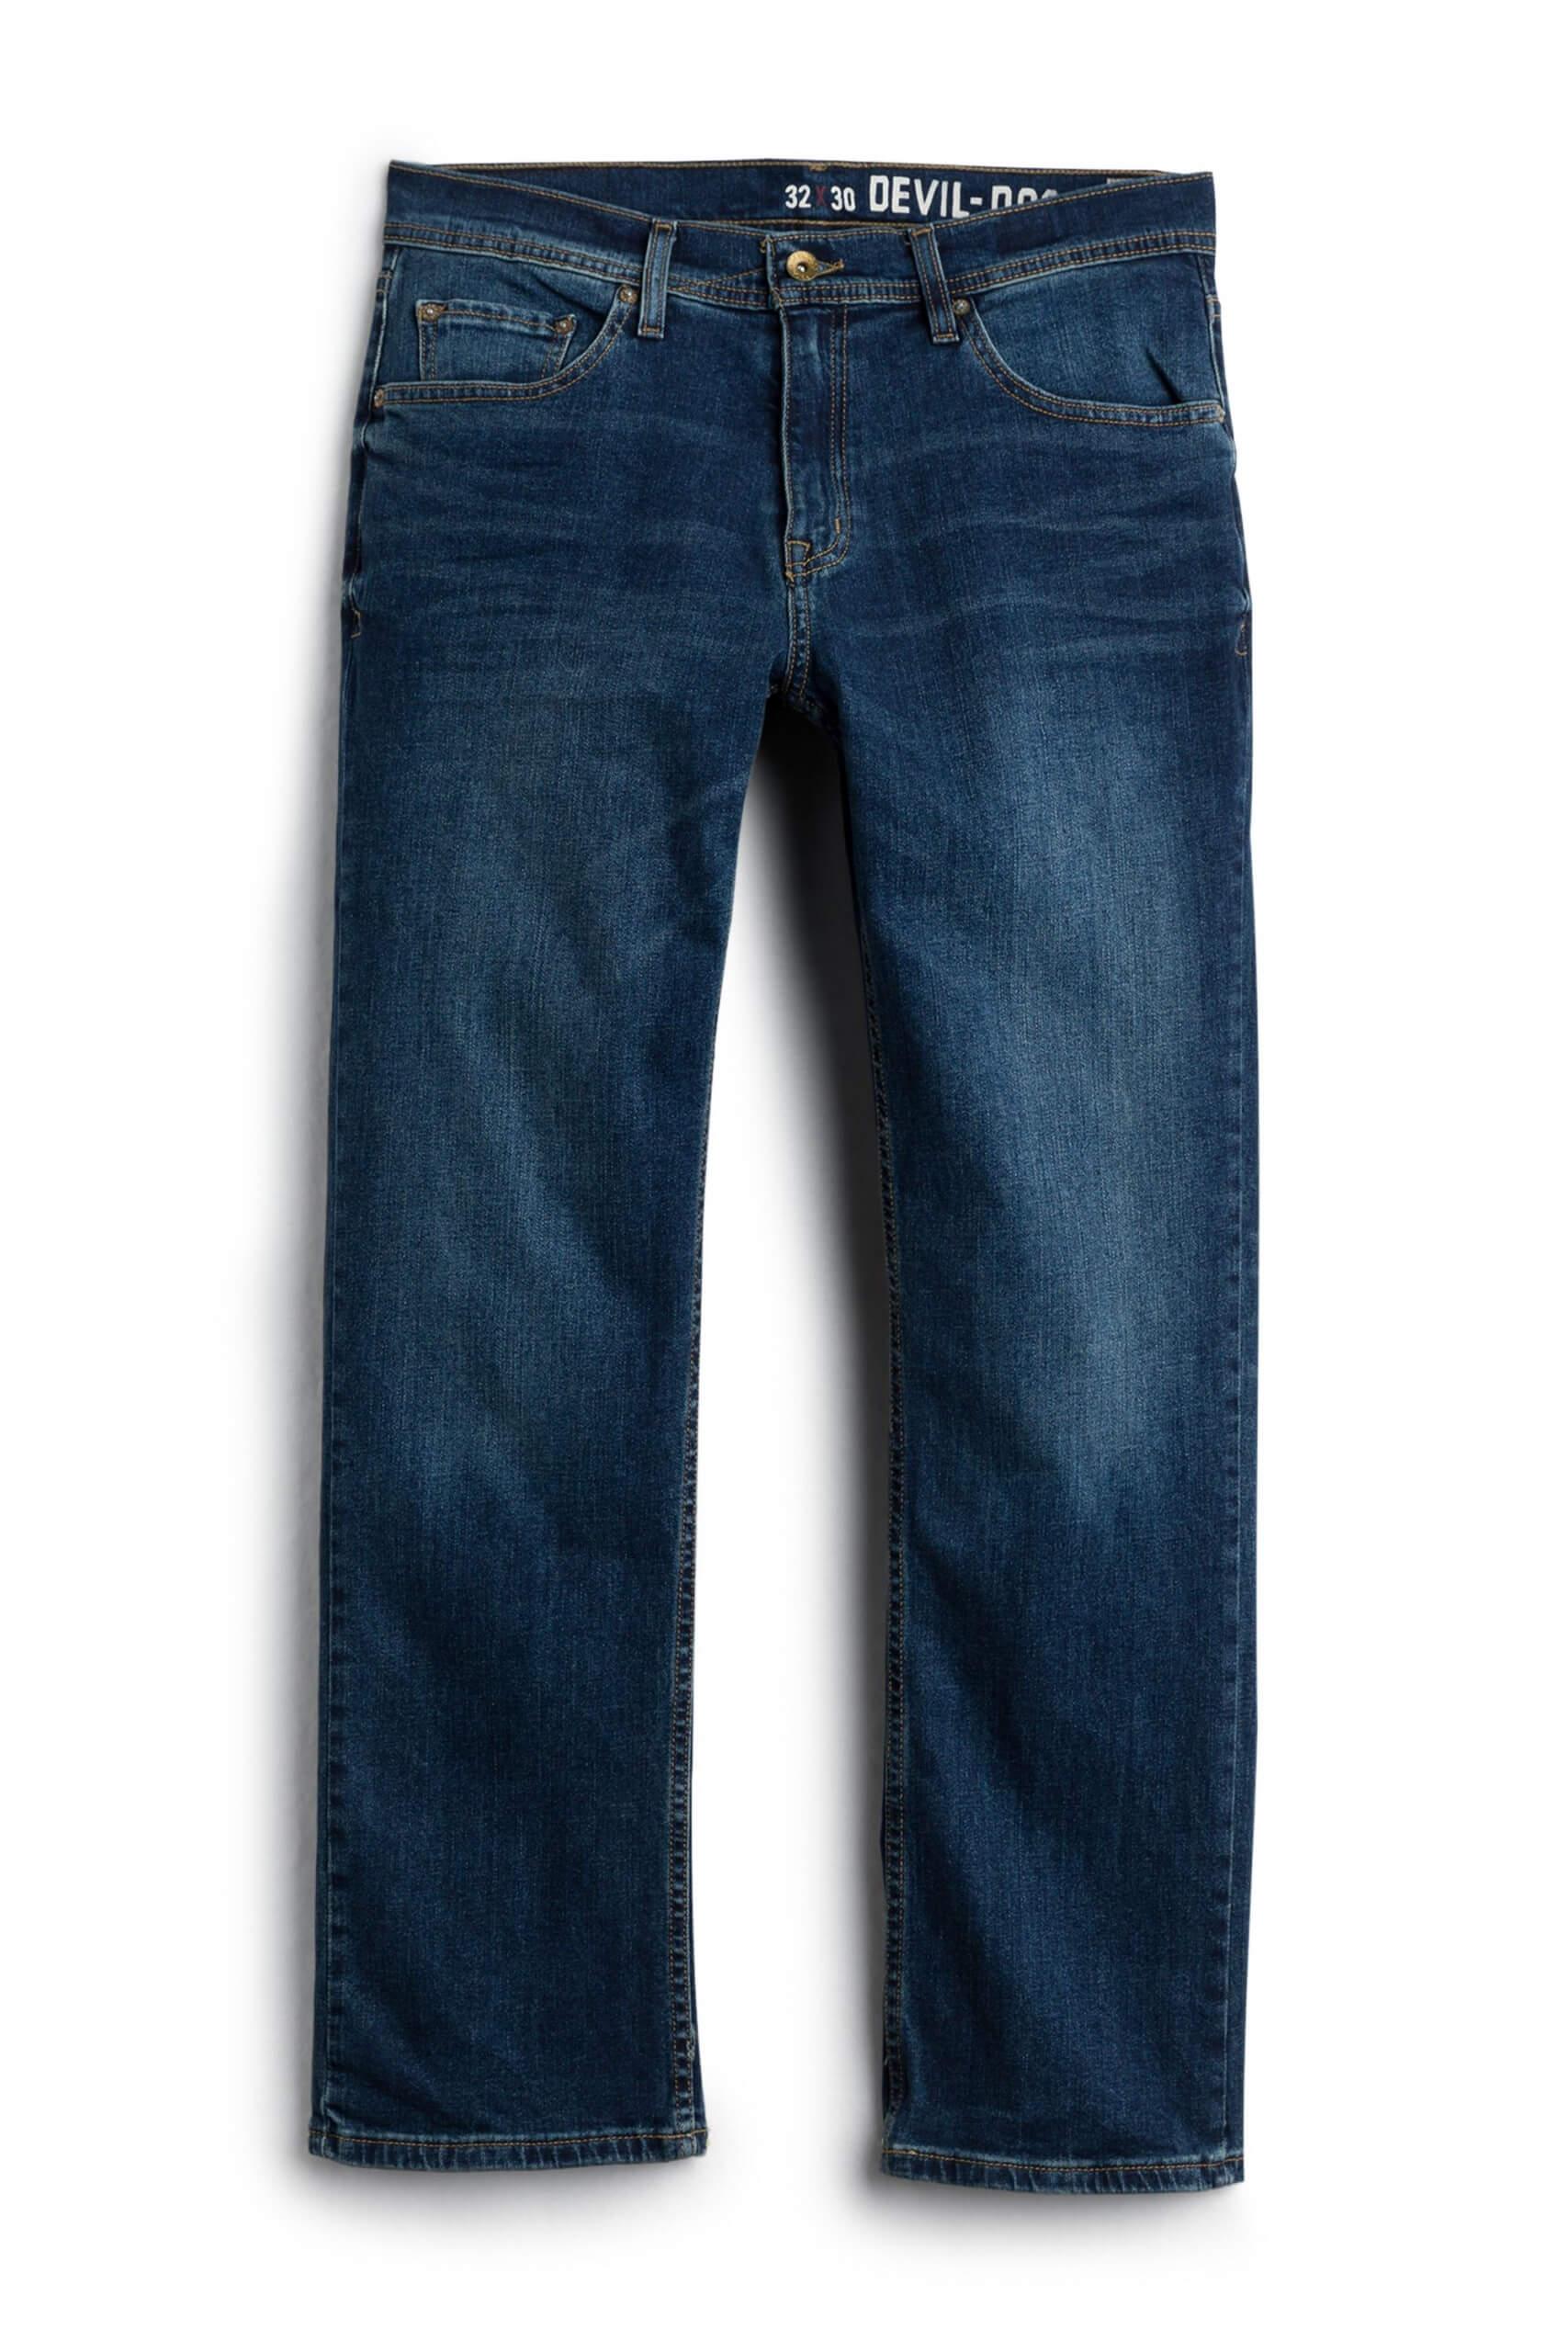 Stitch Fix Men's bootcut jeans.